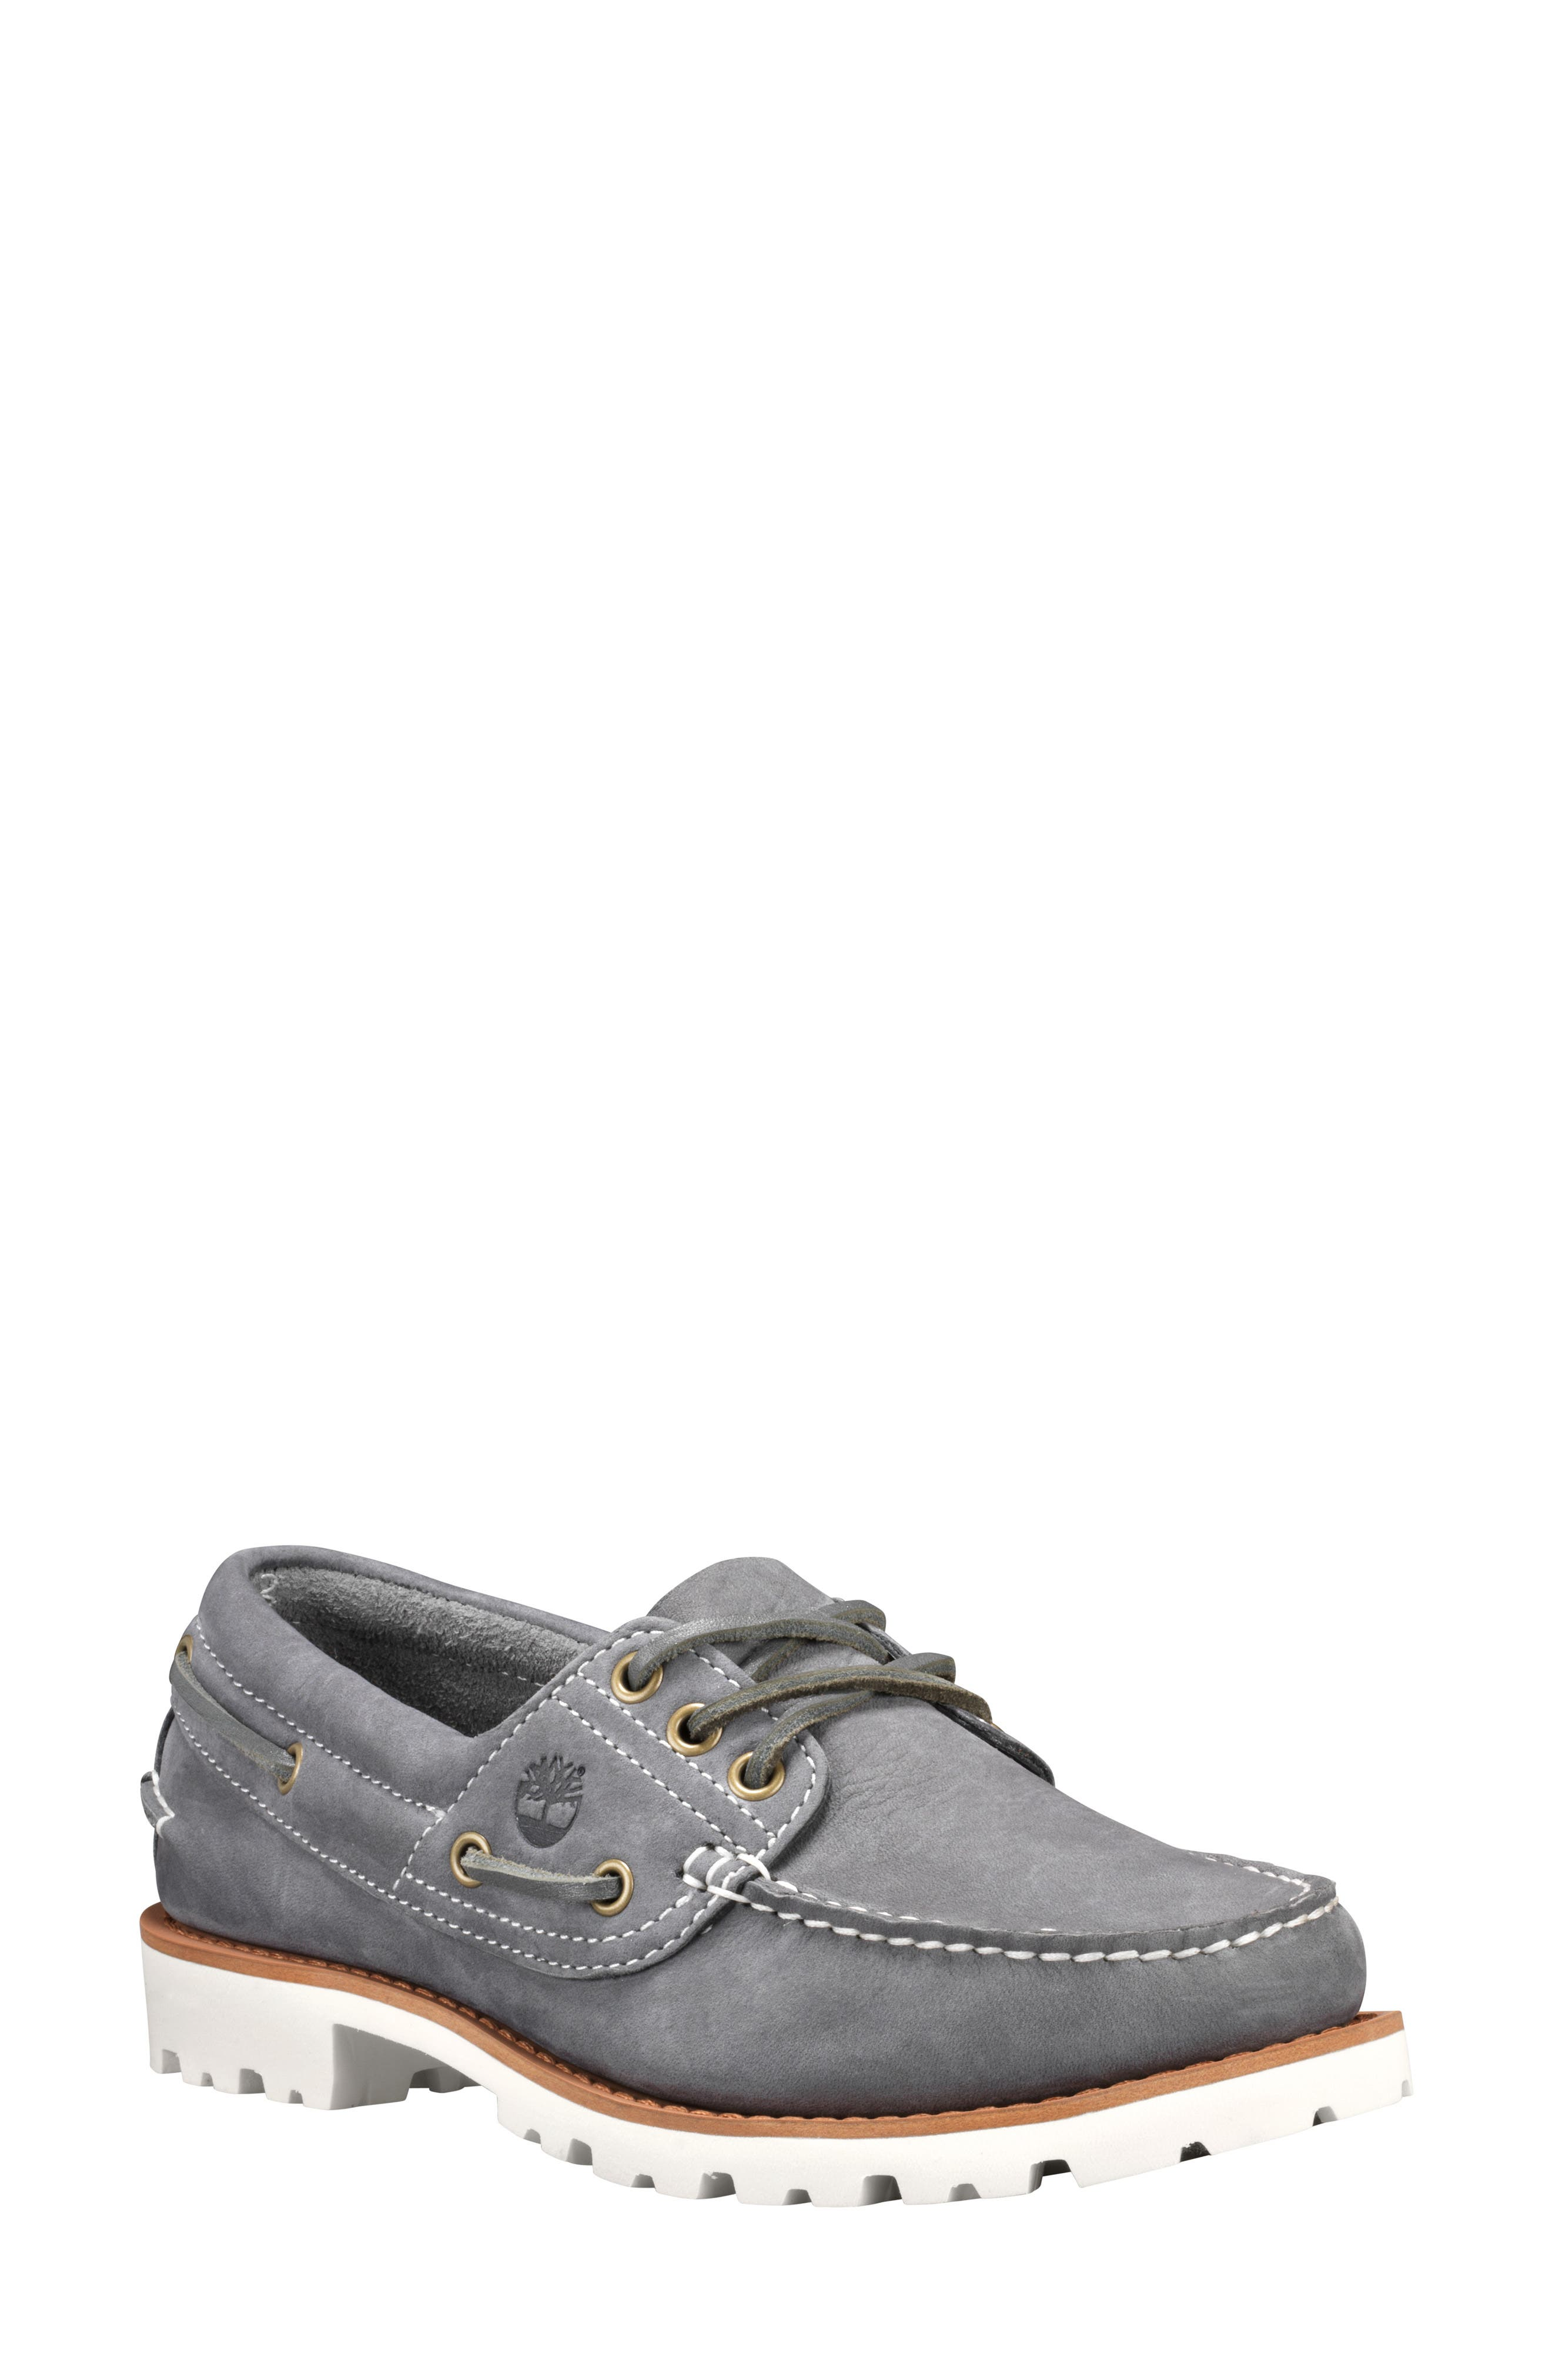 Timberland Noreen Boat Shoe, Grey